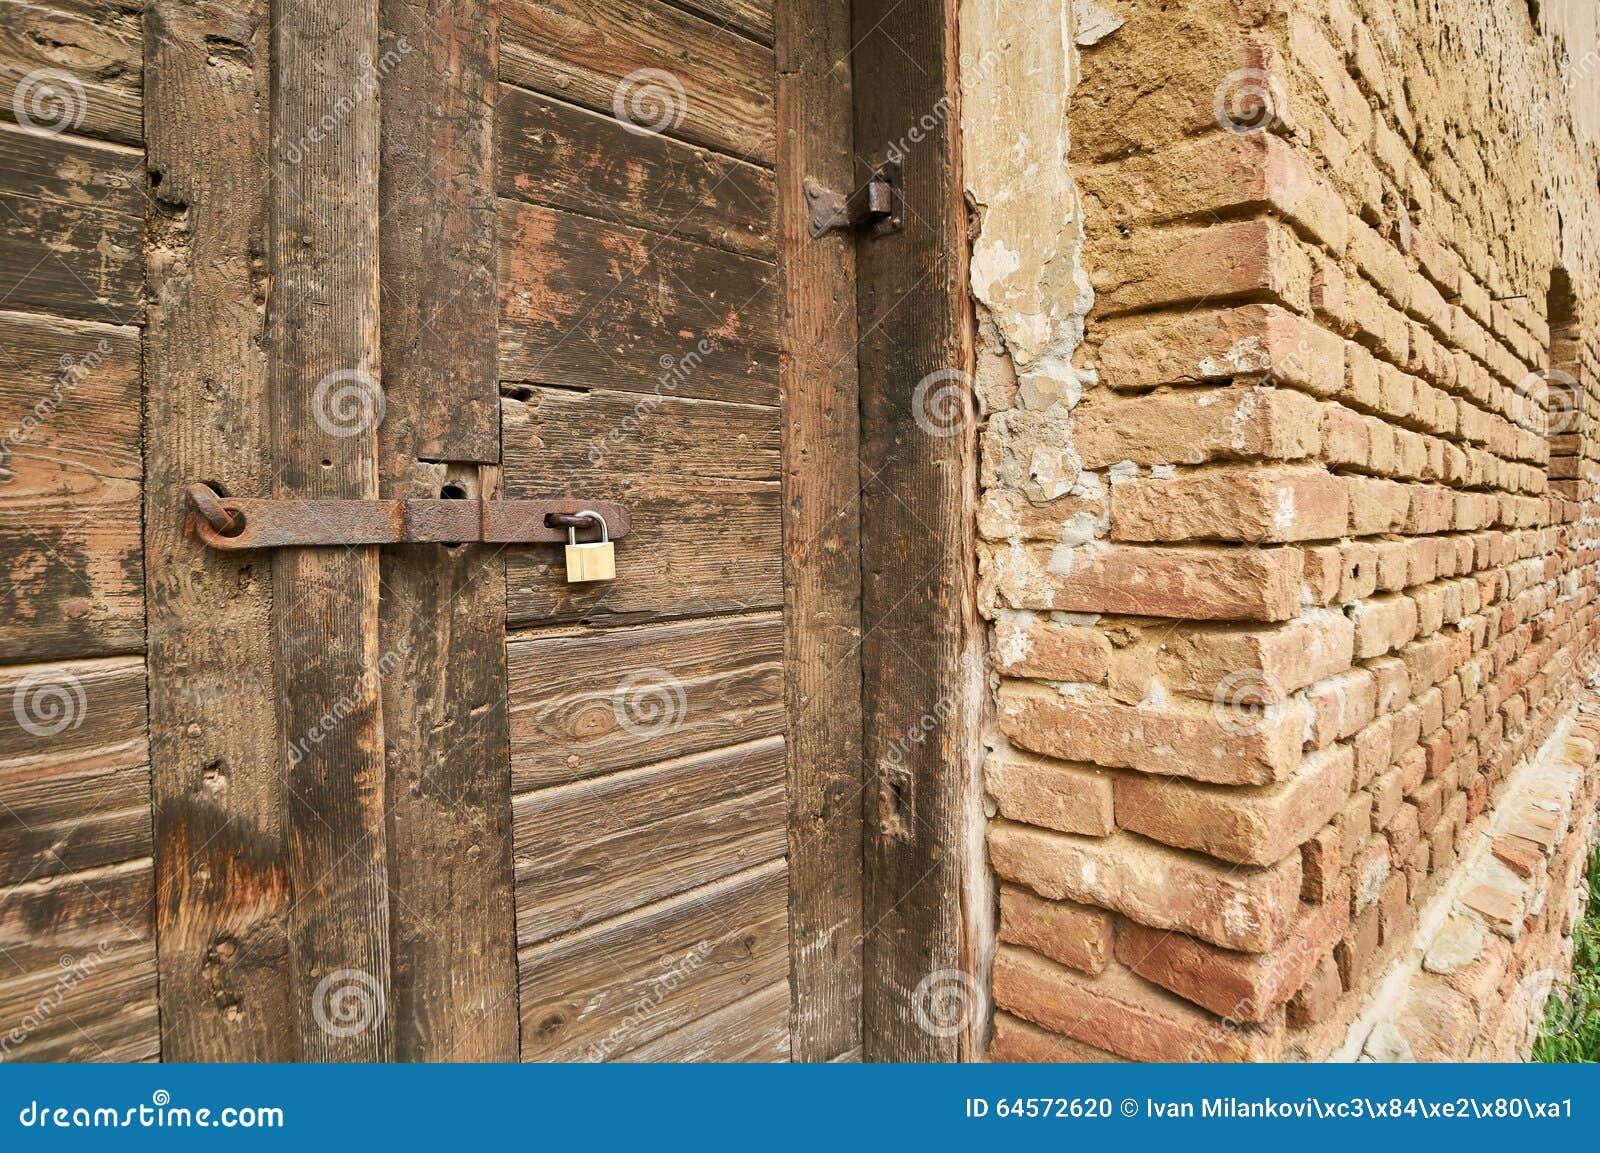 Verschlossene tür  Verschlossene Tür Stockfoto - Bild: 64572620